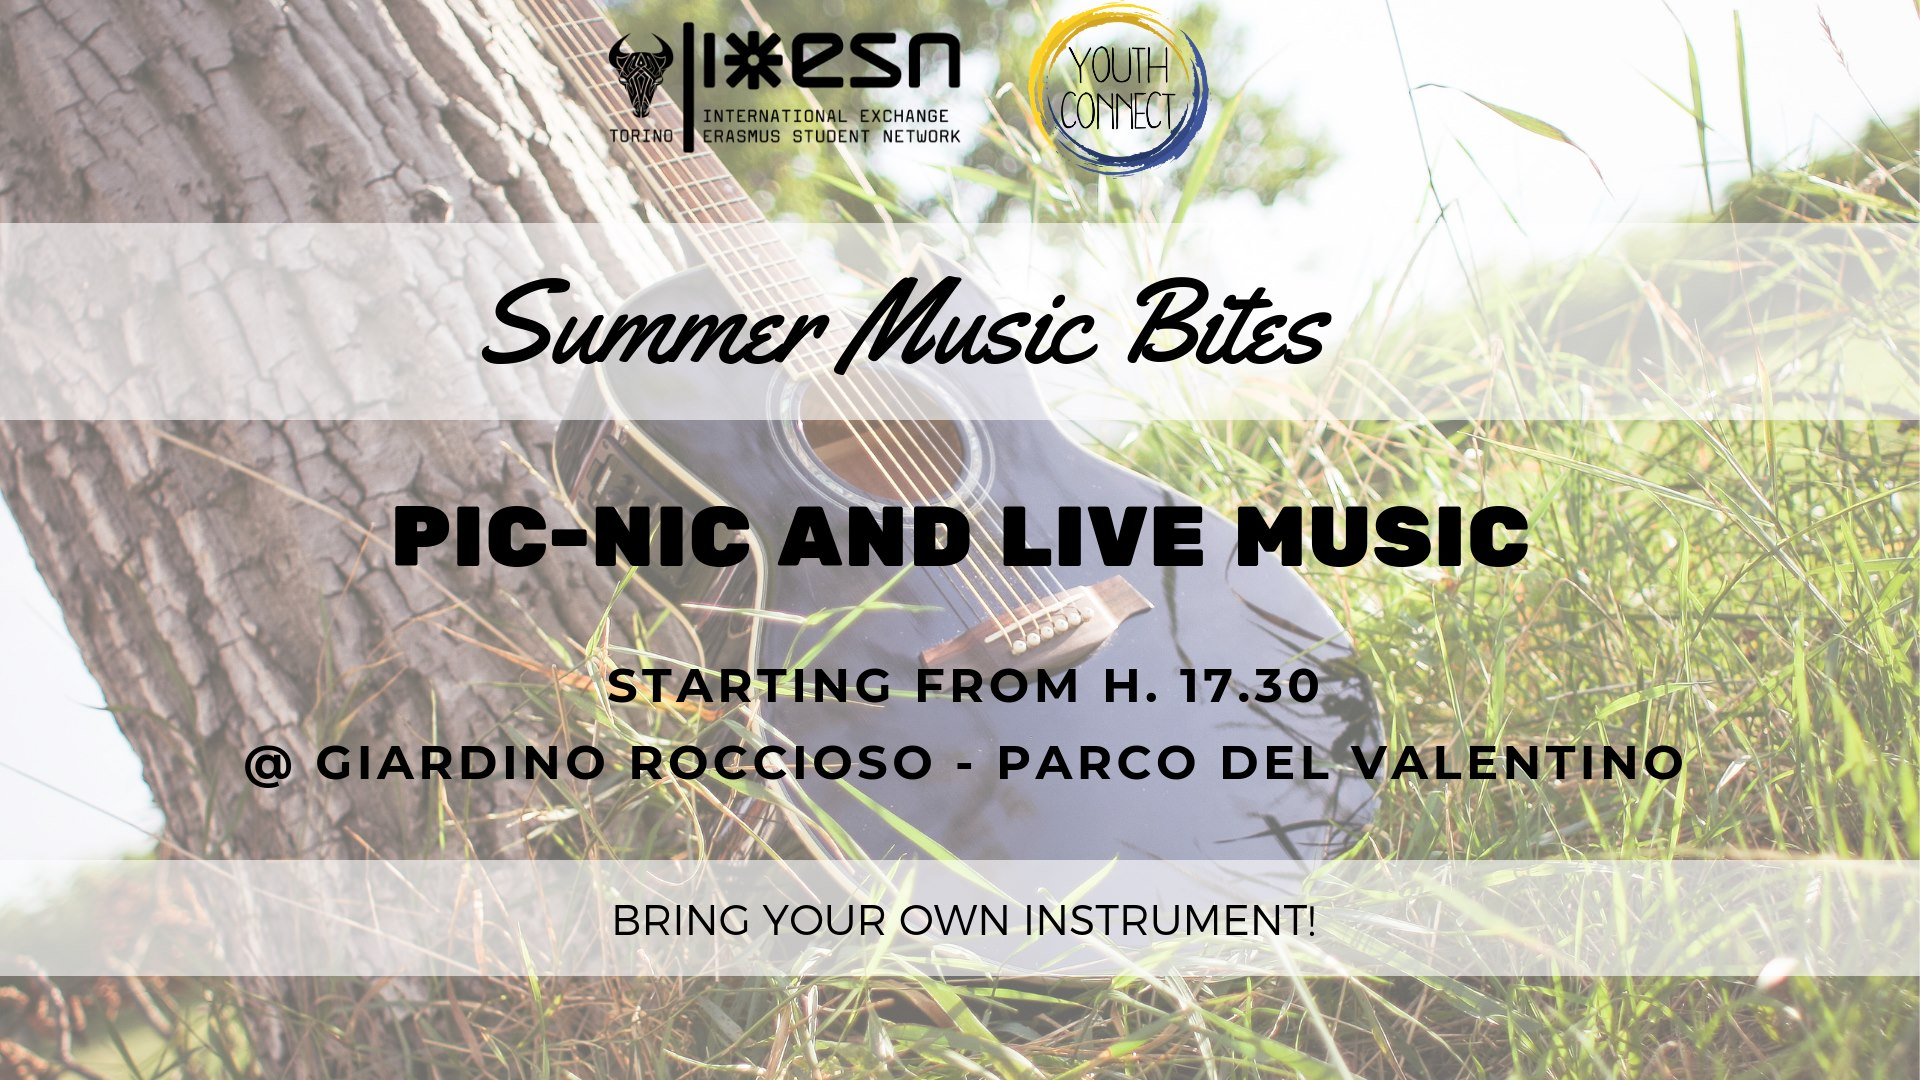 Summer Music Bites